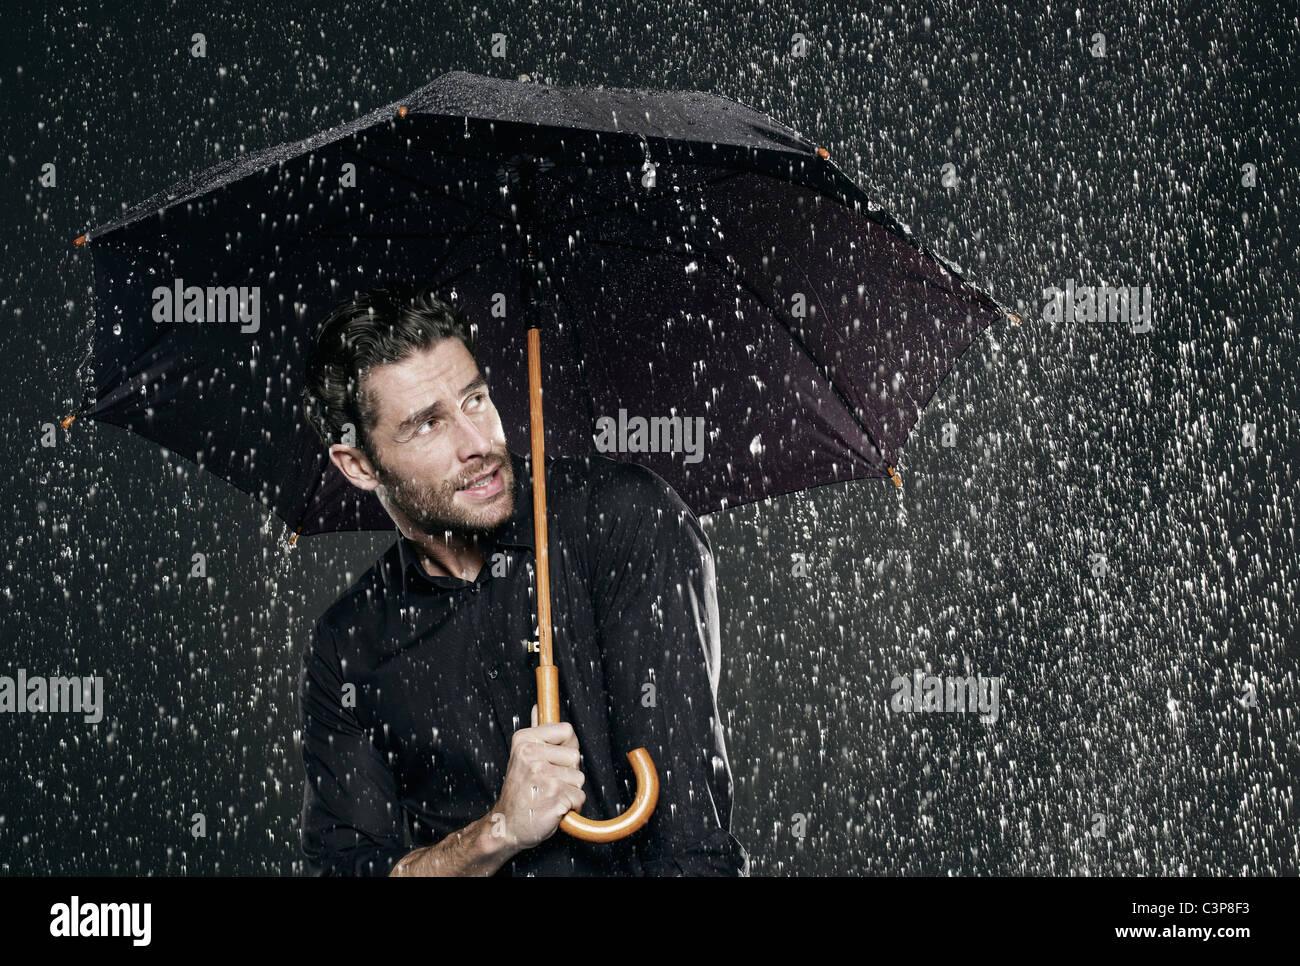 Rain Drop Wallpaper Hd Man Holding Umbrella In Rain Looking Away Stock Photo